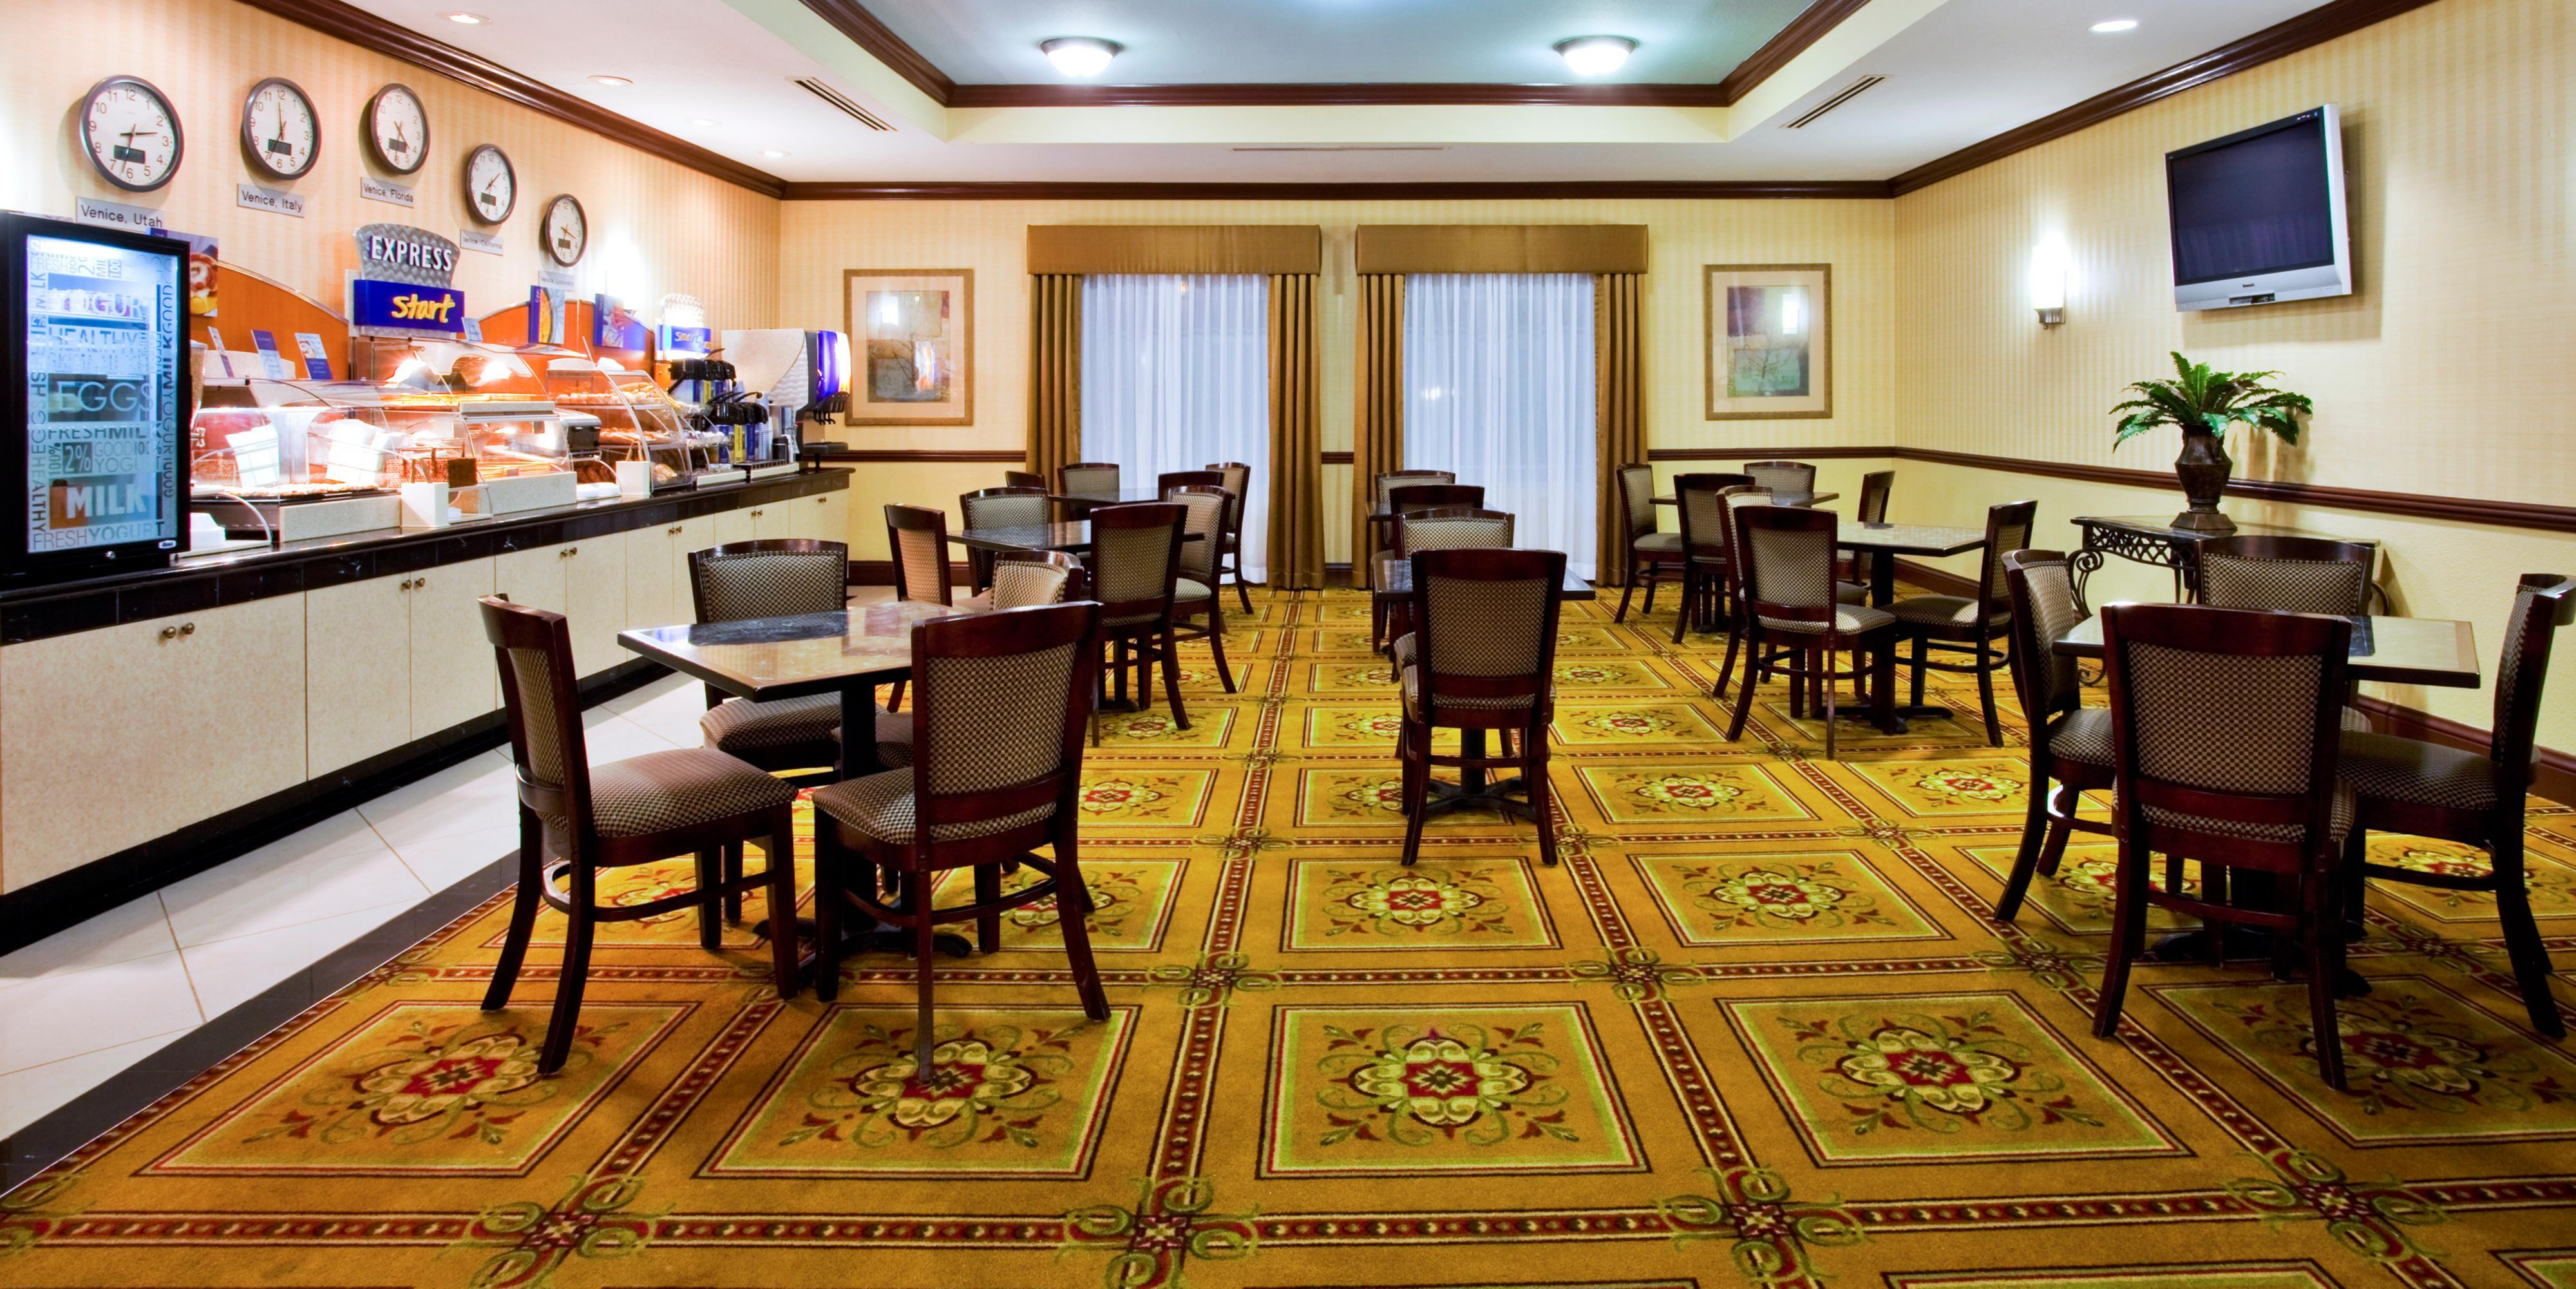 Holiday Inn Express Venice 2533035206 2x1